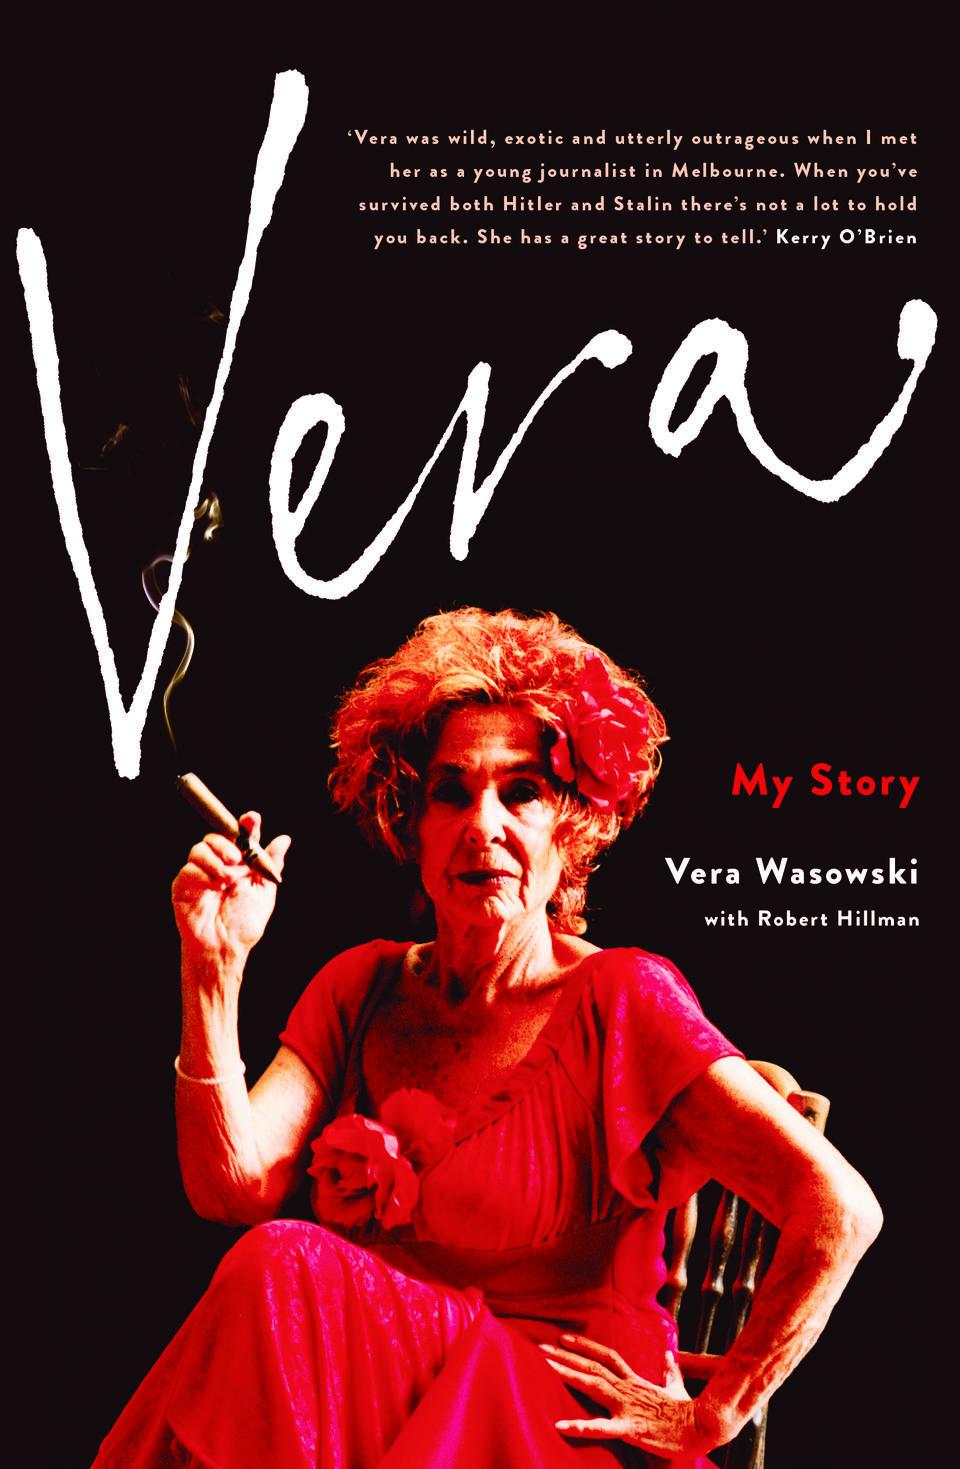 Vera: My Story cover